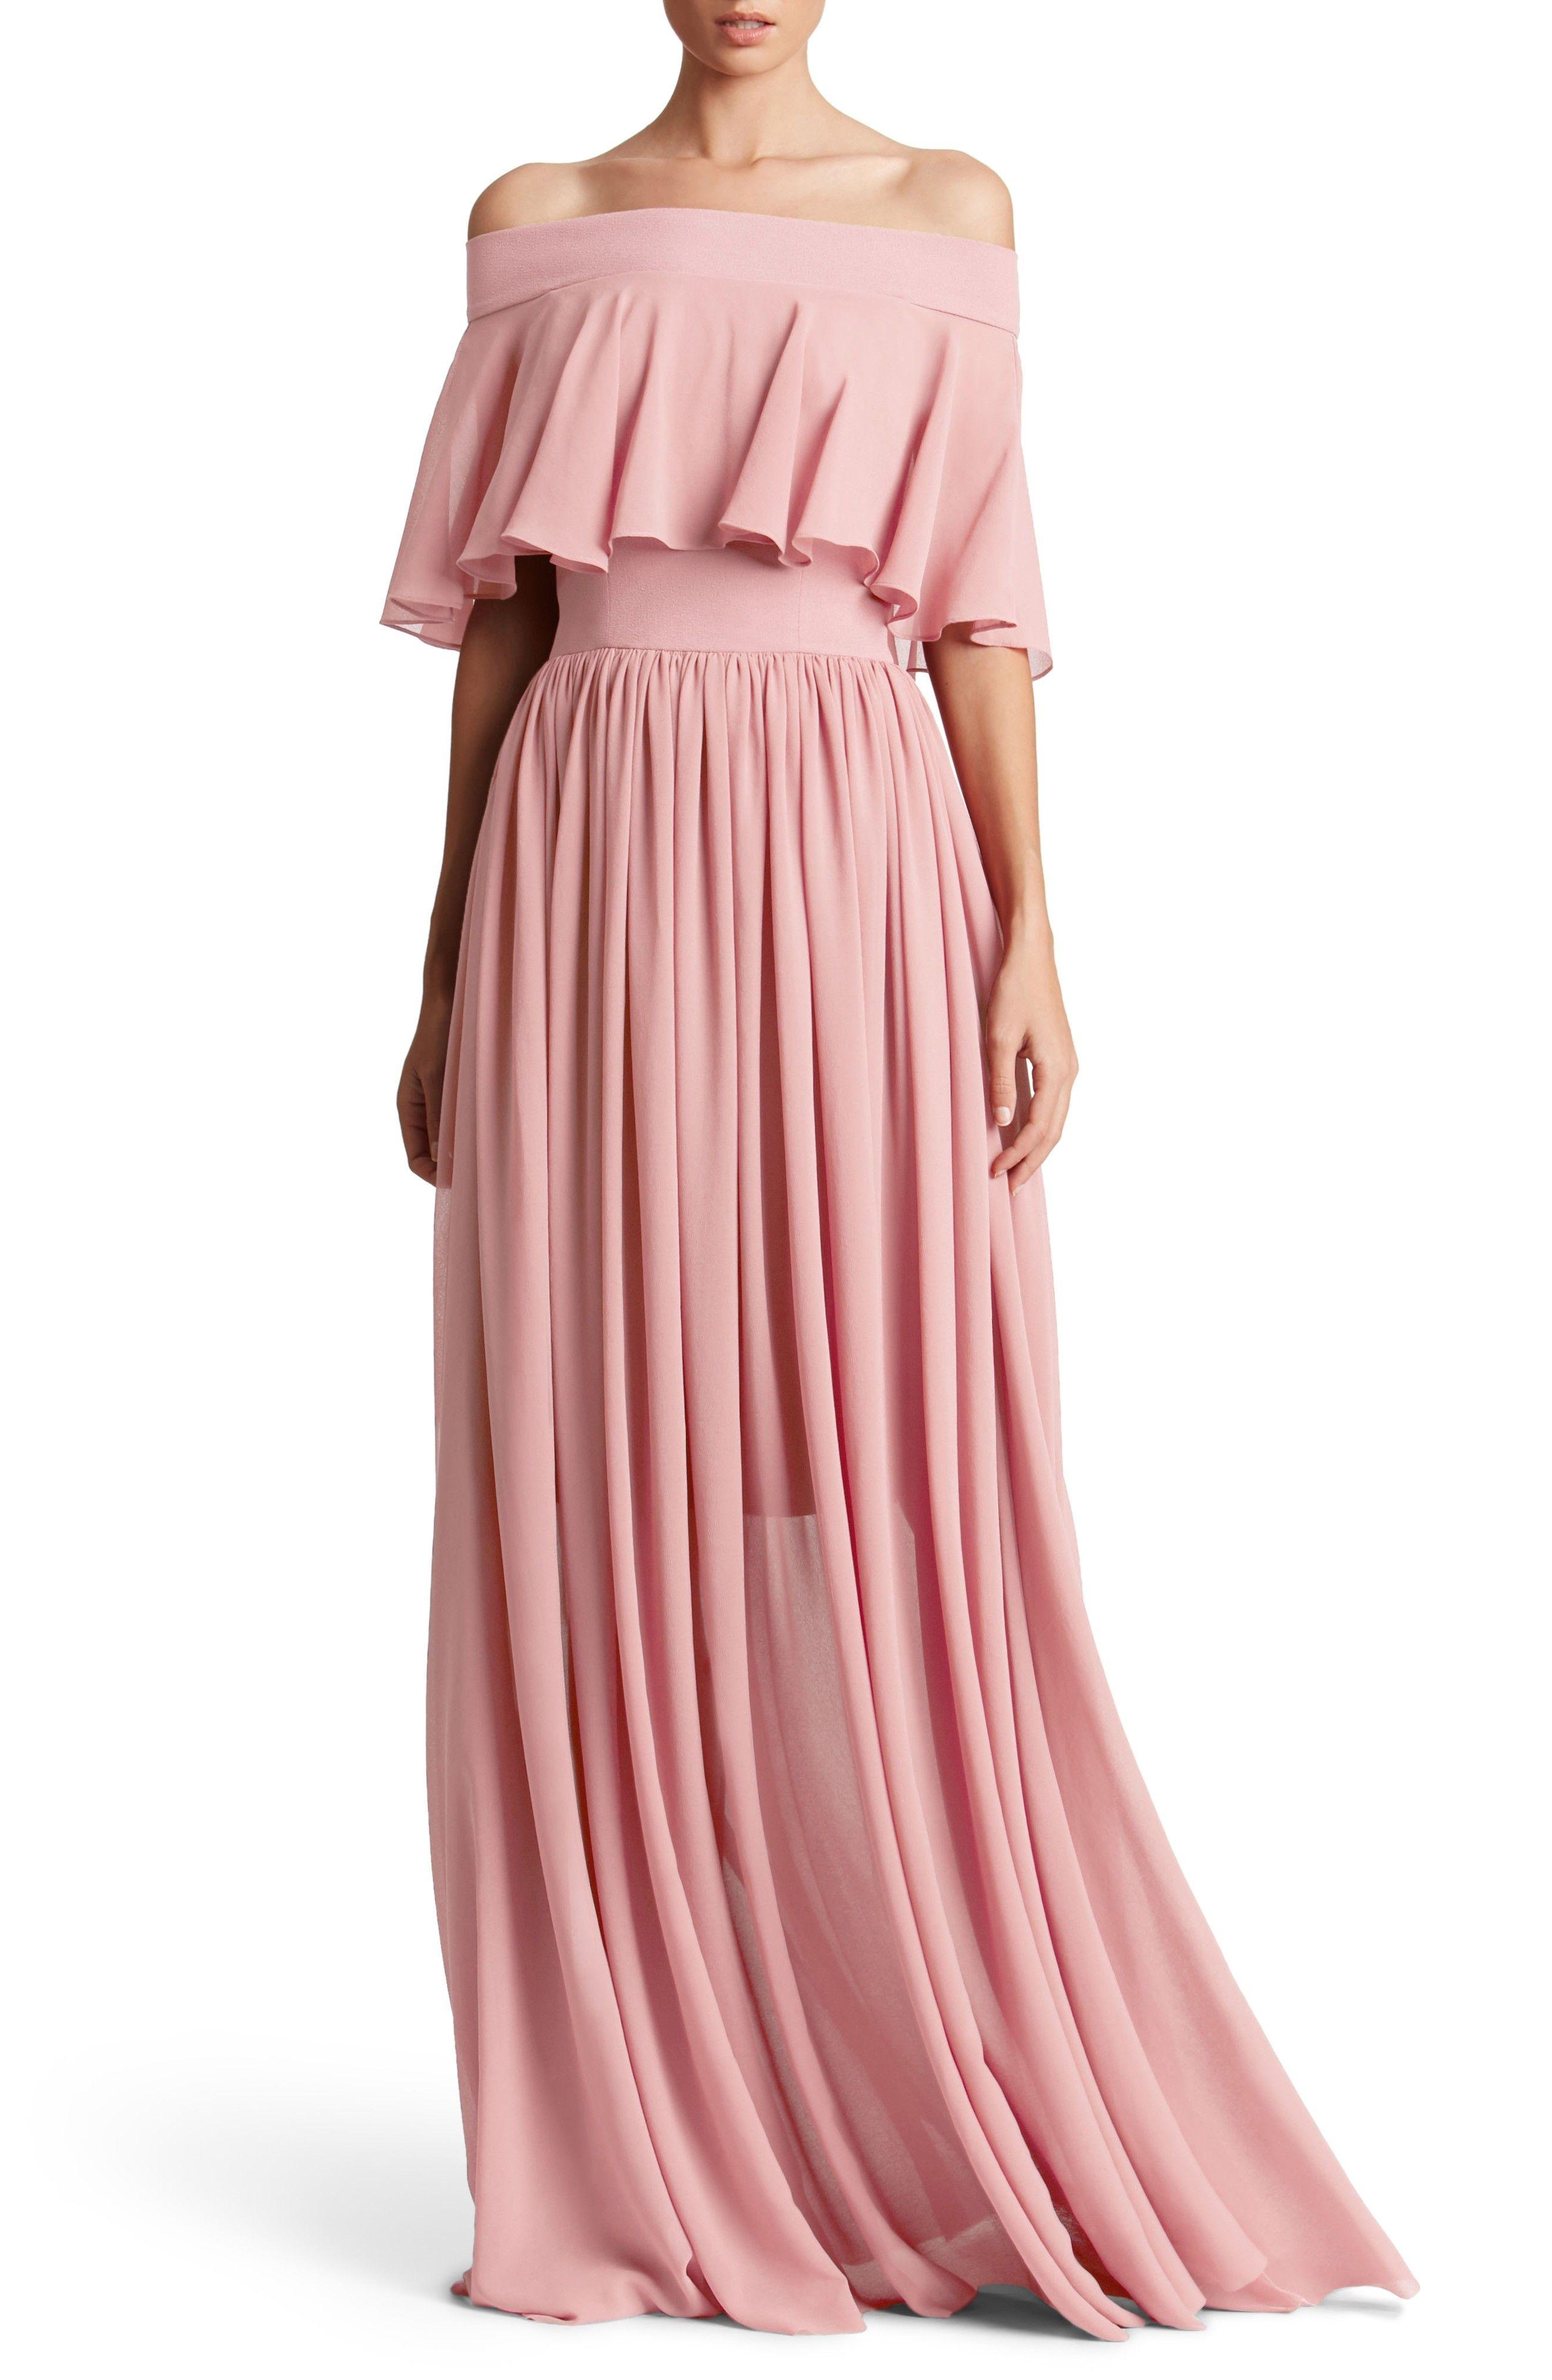 Blush Wedding Styling + Nordstrom Anniversary Sale